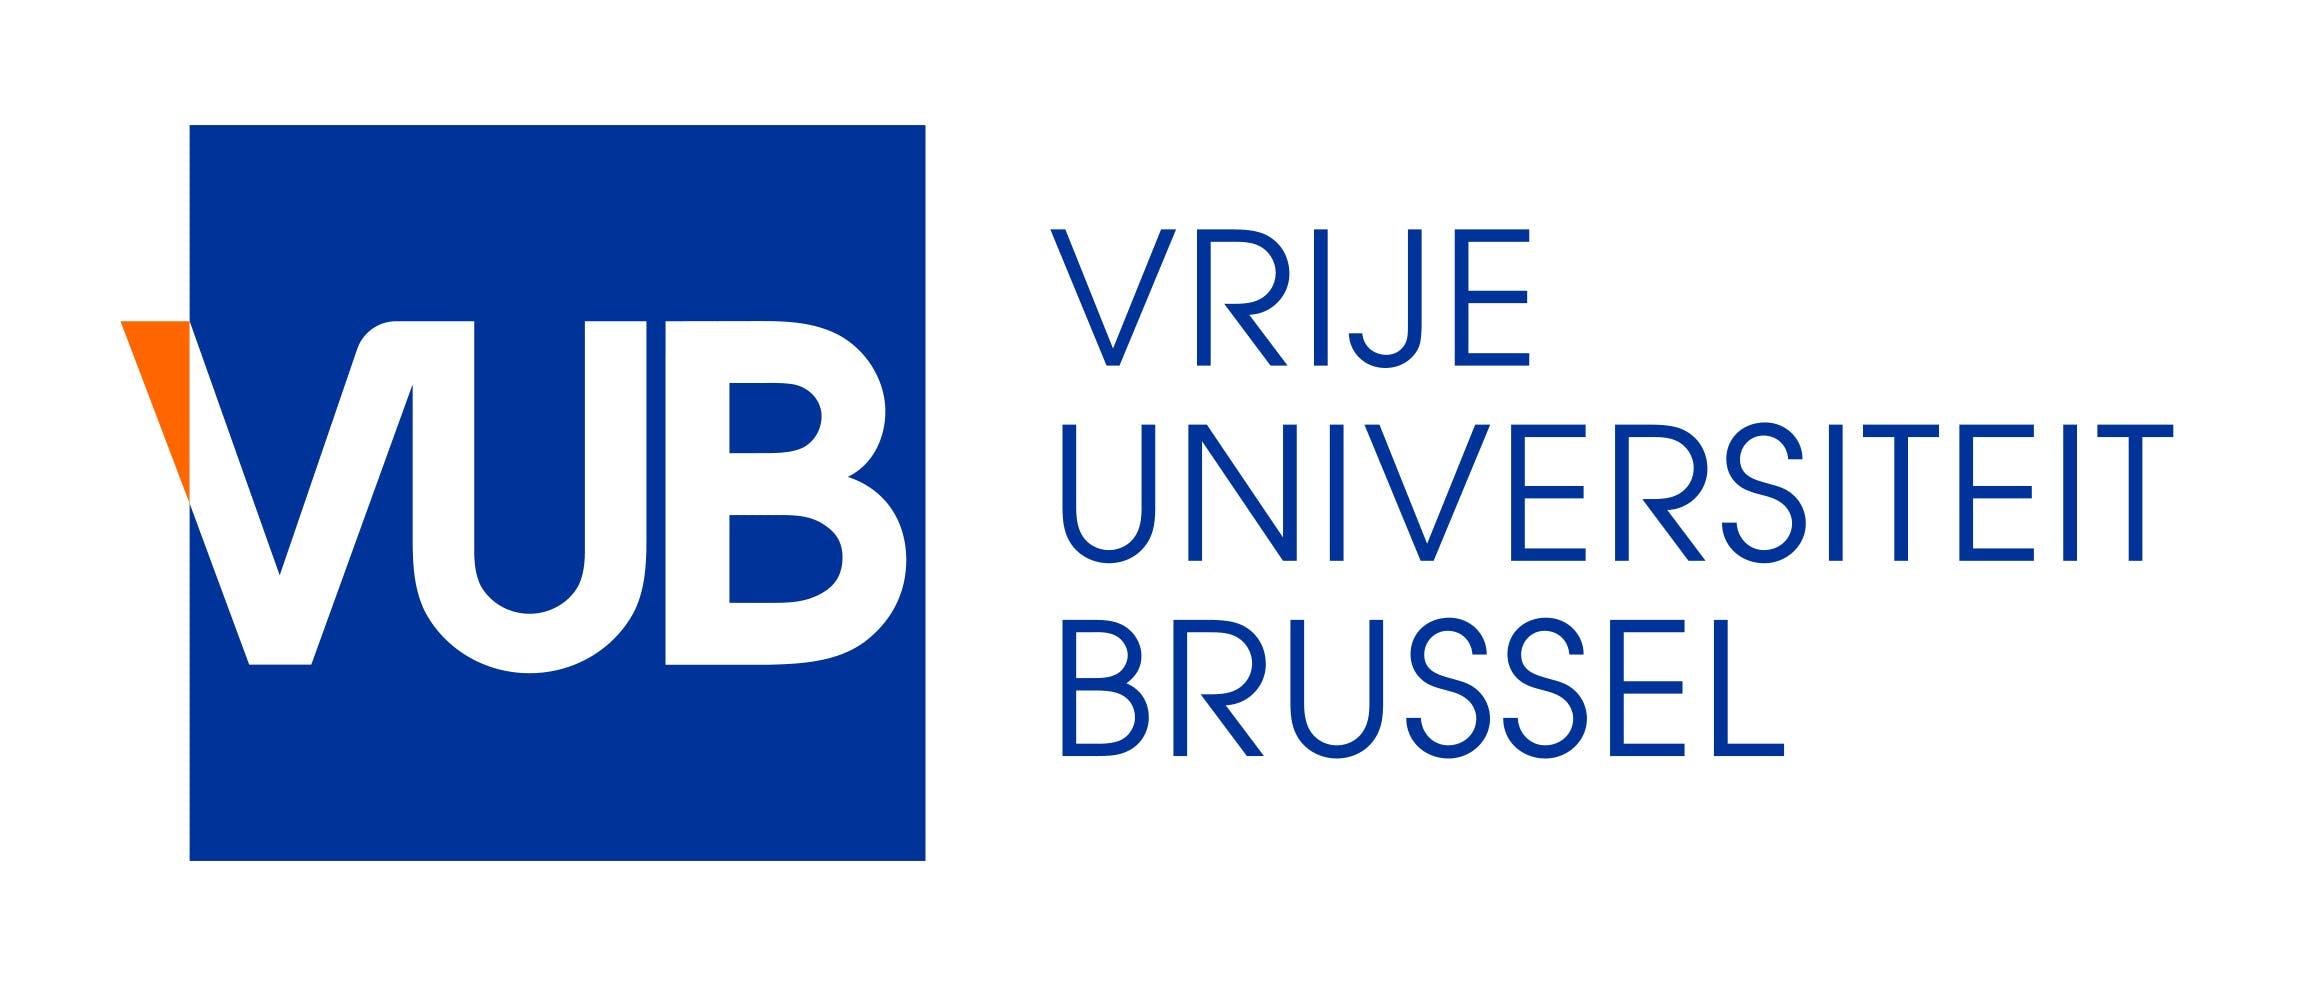 Vrije Universiteit Brussel (VUB) - Brussels - Belgium ... on